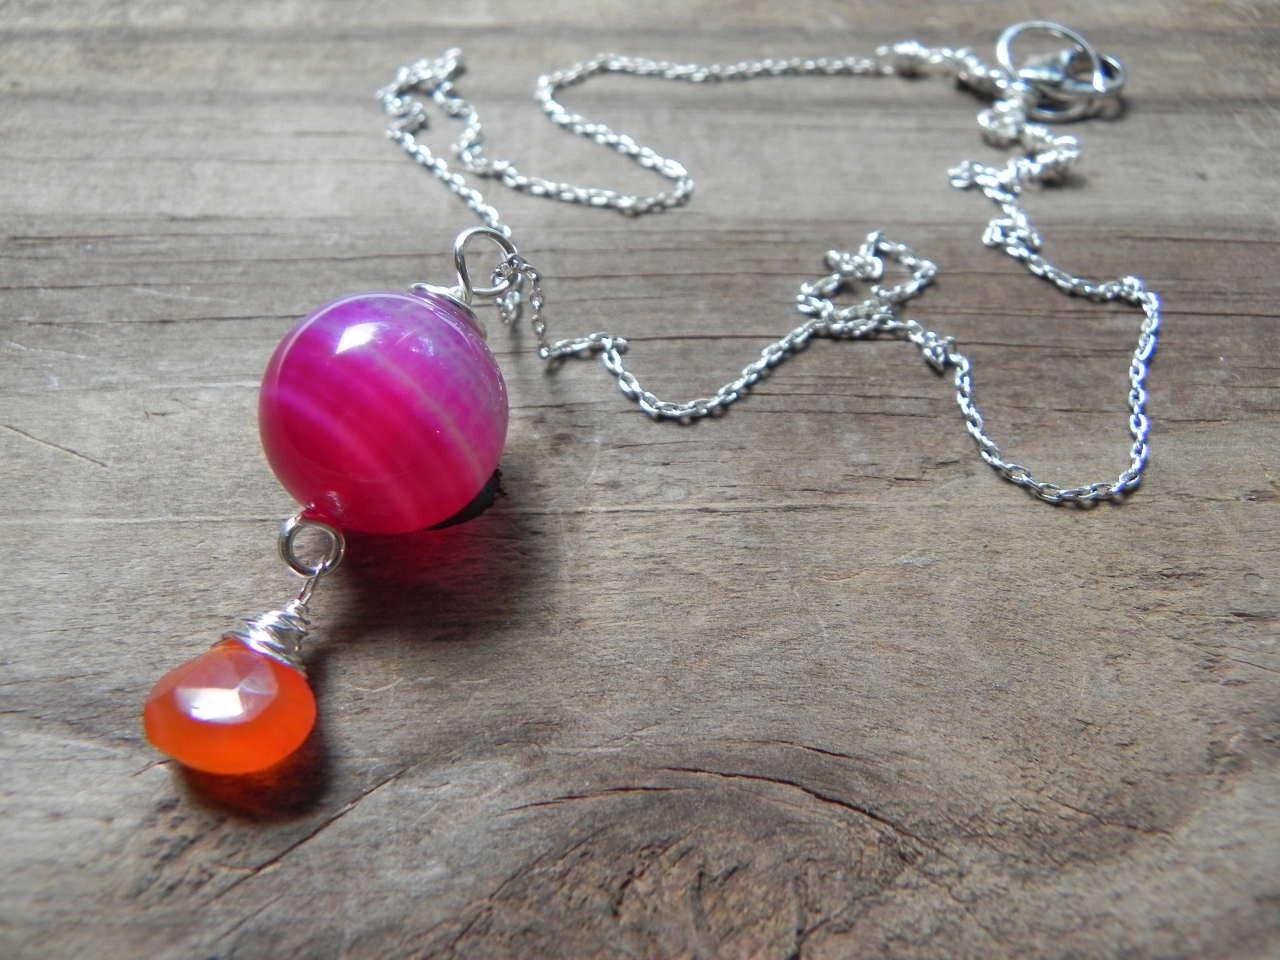 carnelian pendant necklace, pink agate beaded necklace, color blocked pendant necklace, juicy colorful necklace - AdrianaSoto